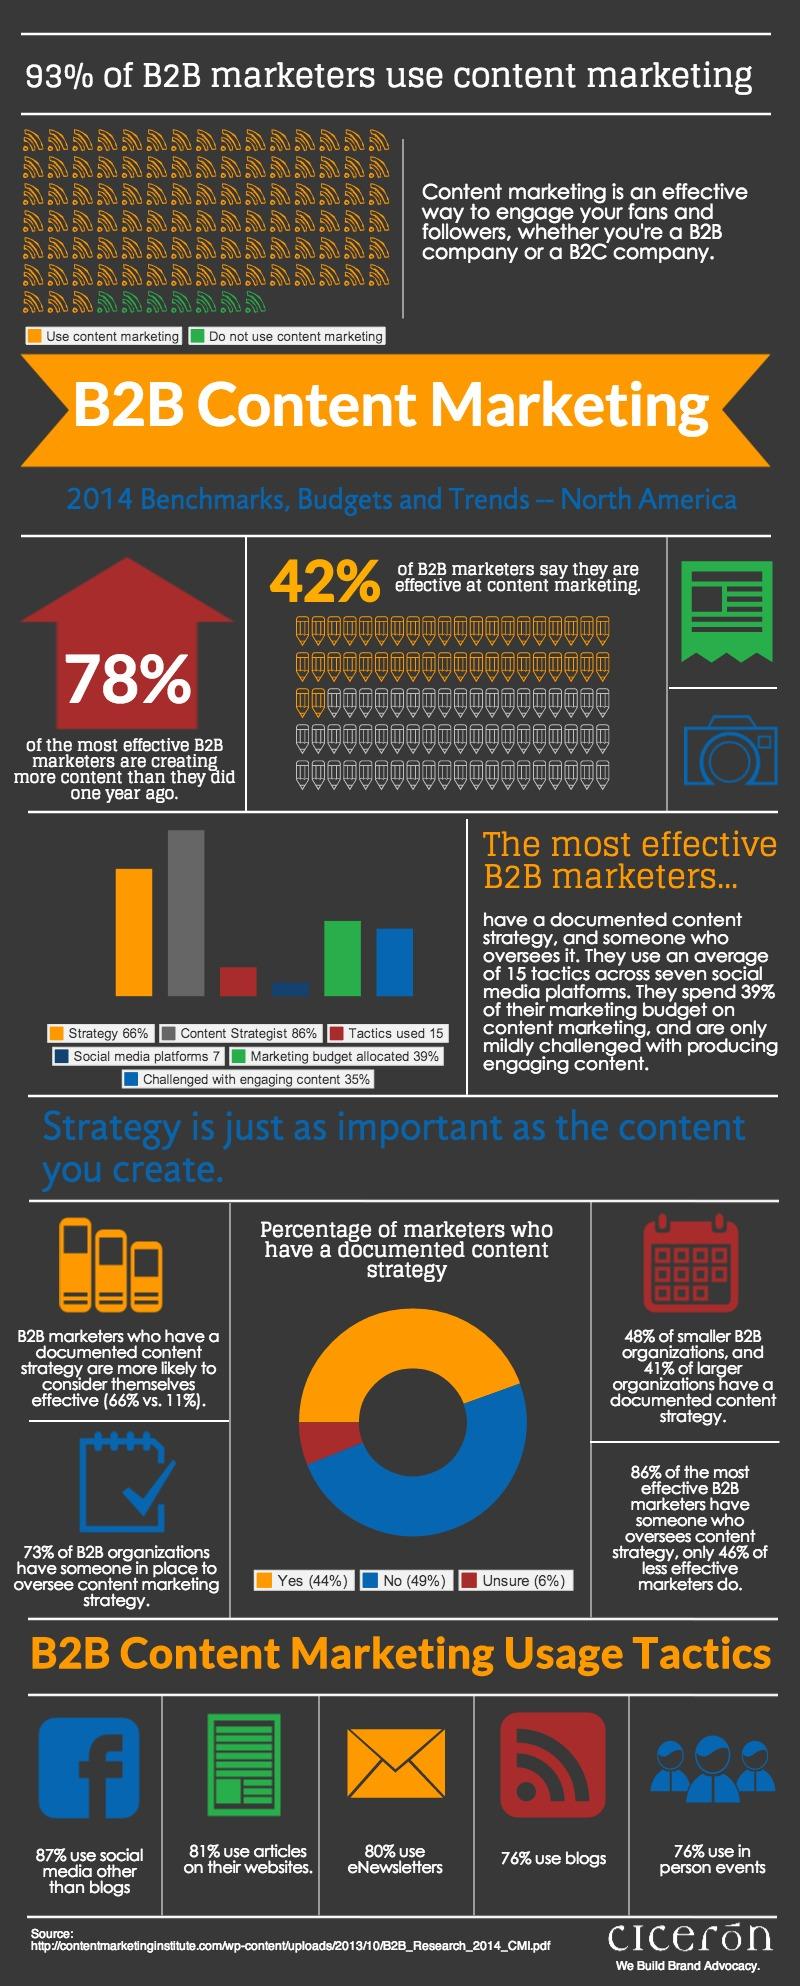 Stratégie B2B content marketing